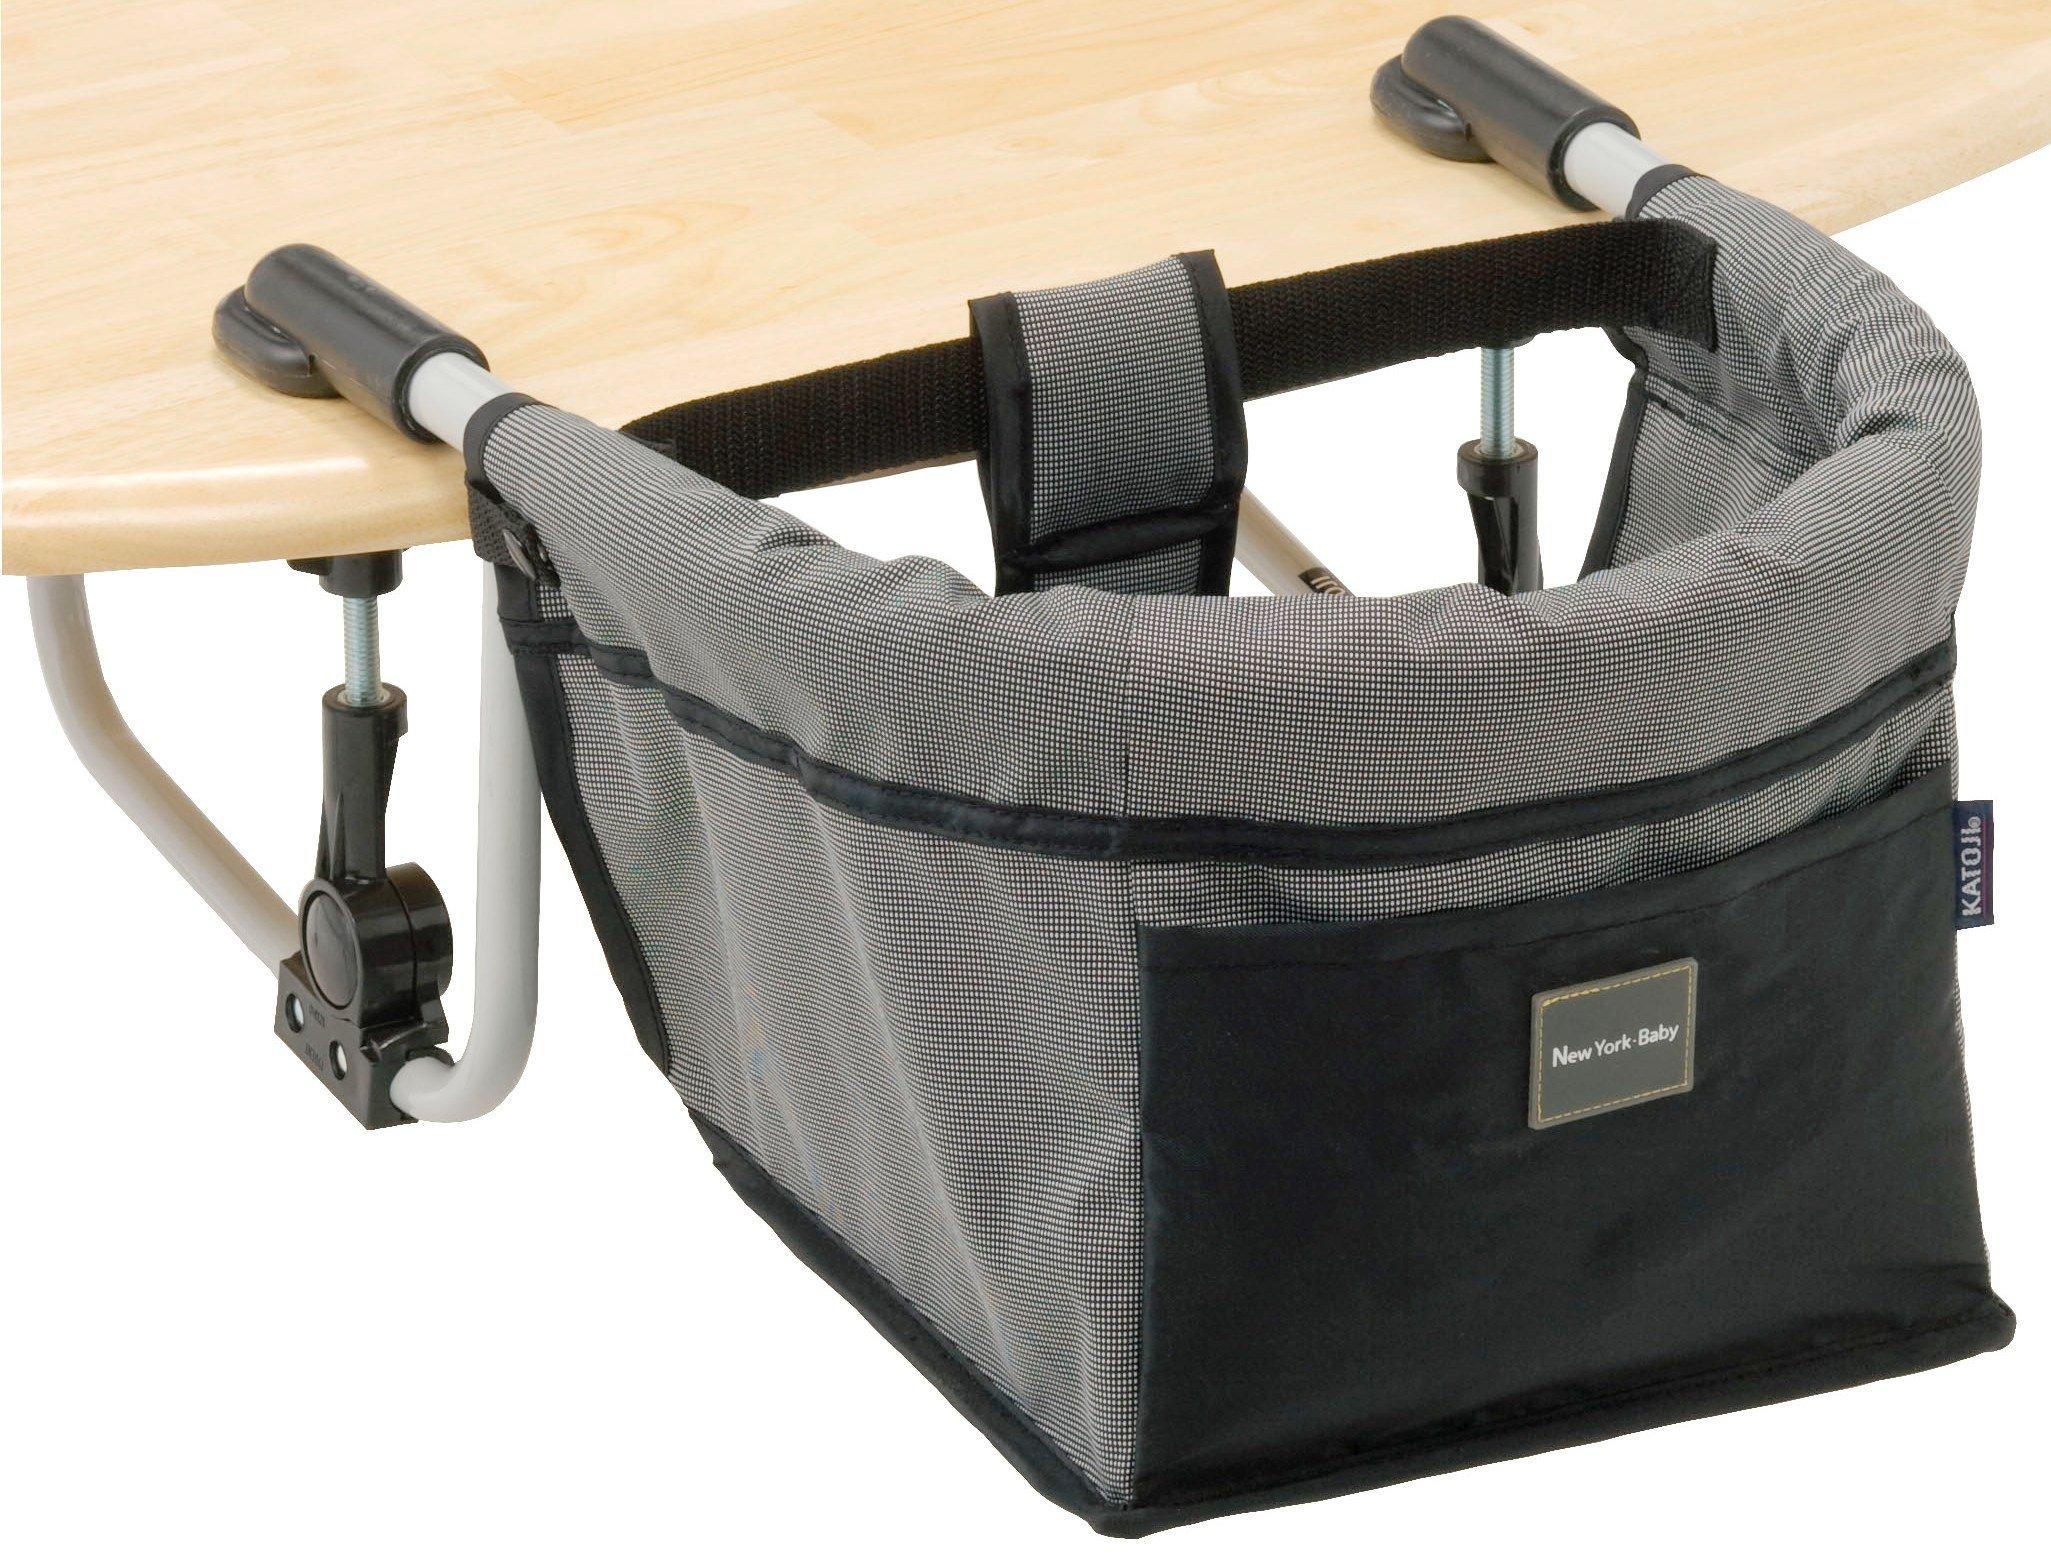 NewYork-Baby camping holder 5-point formula 58808